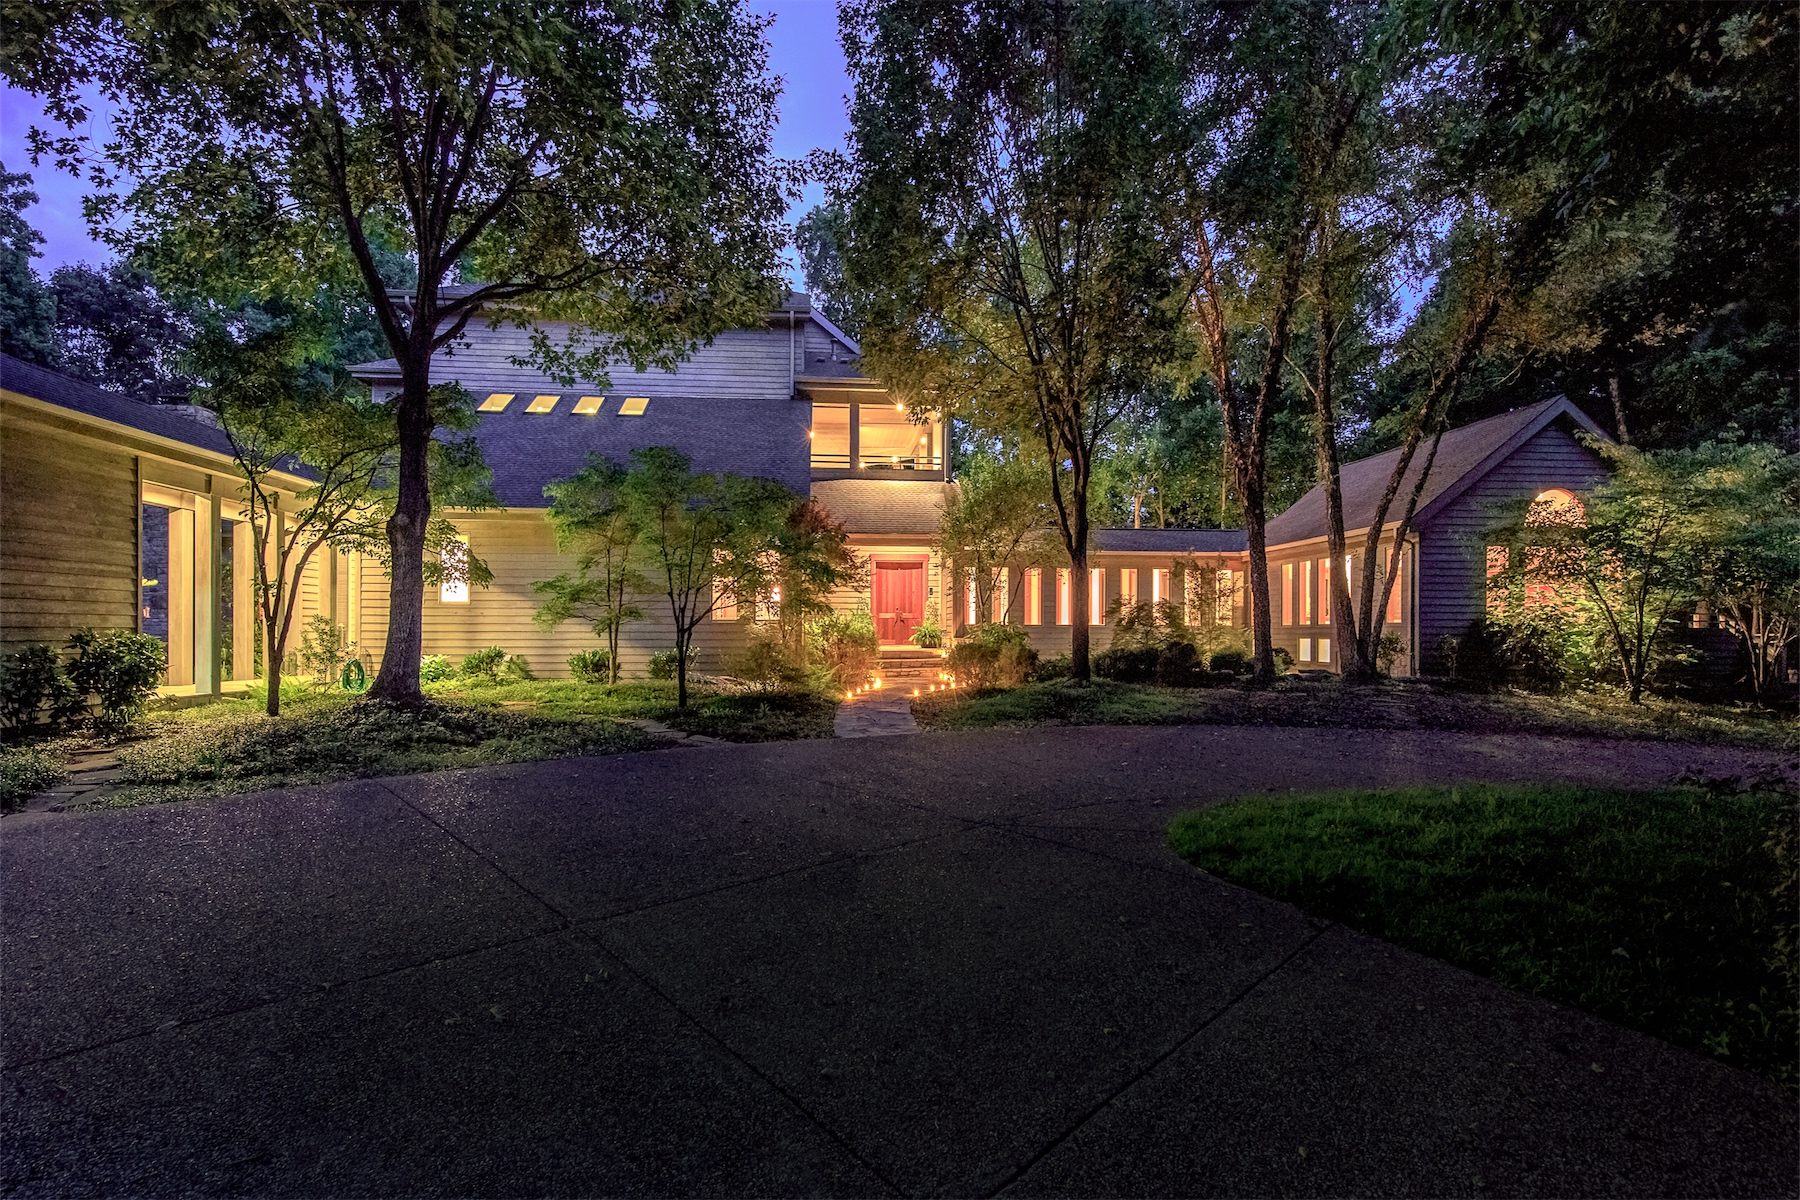 独户住宅 为 销售 在 Gracious Gated Sanctuary on 29 Private Acres 7600 Buffalo Road 那什维尔, 田纳西州 37221 美国